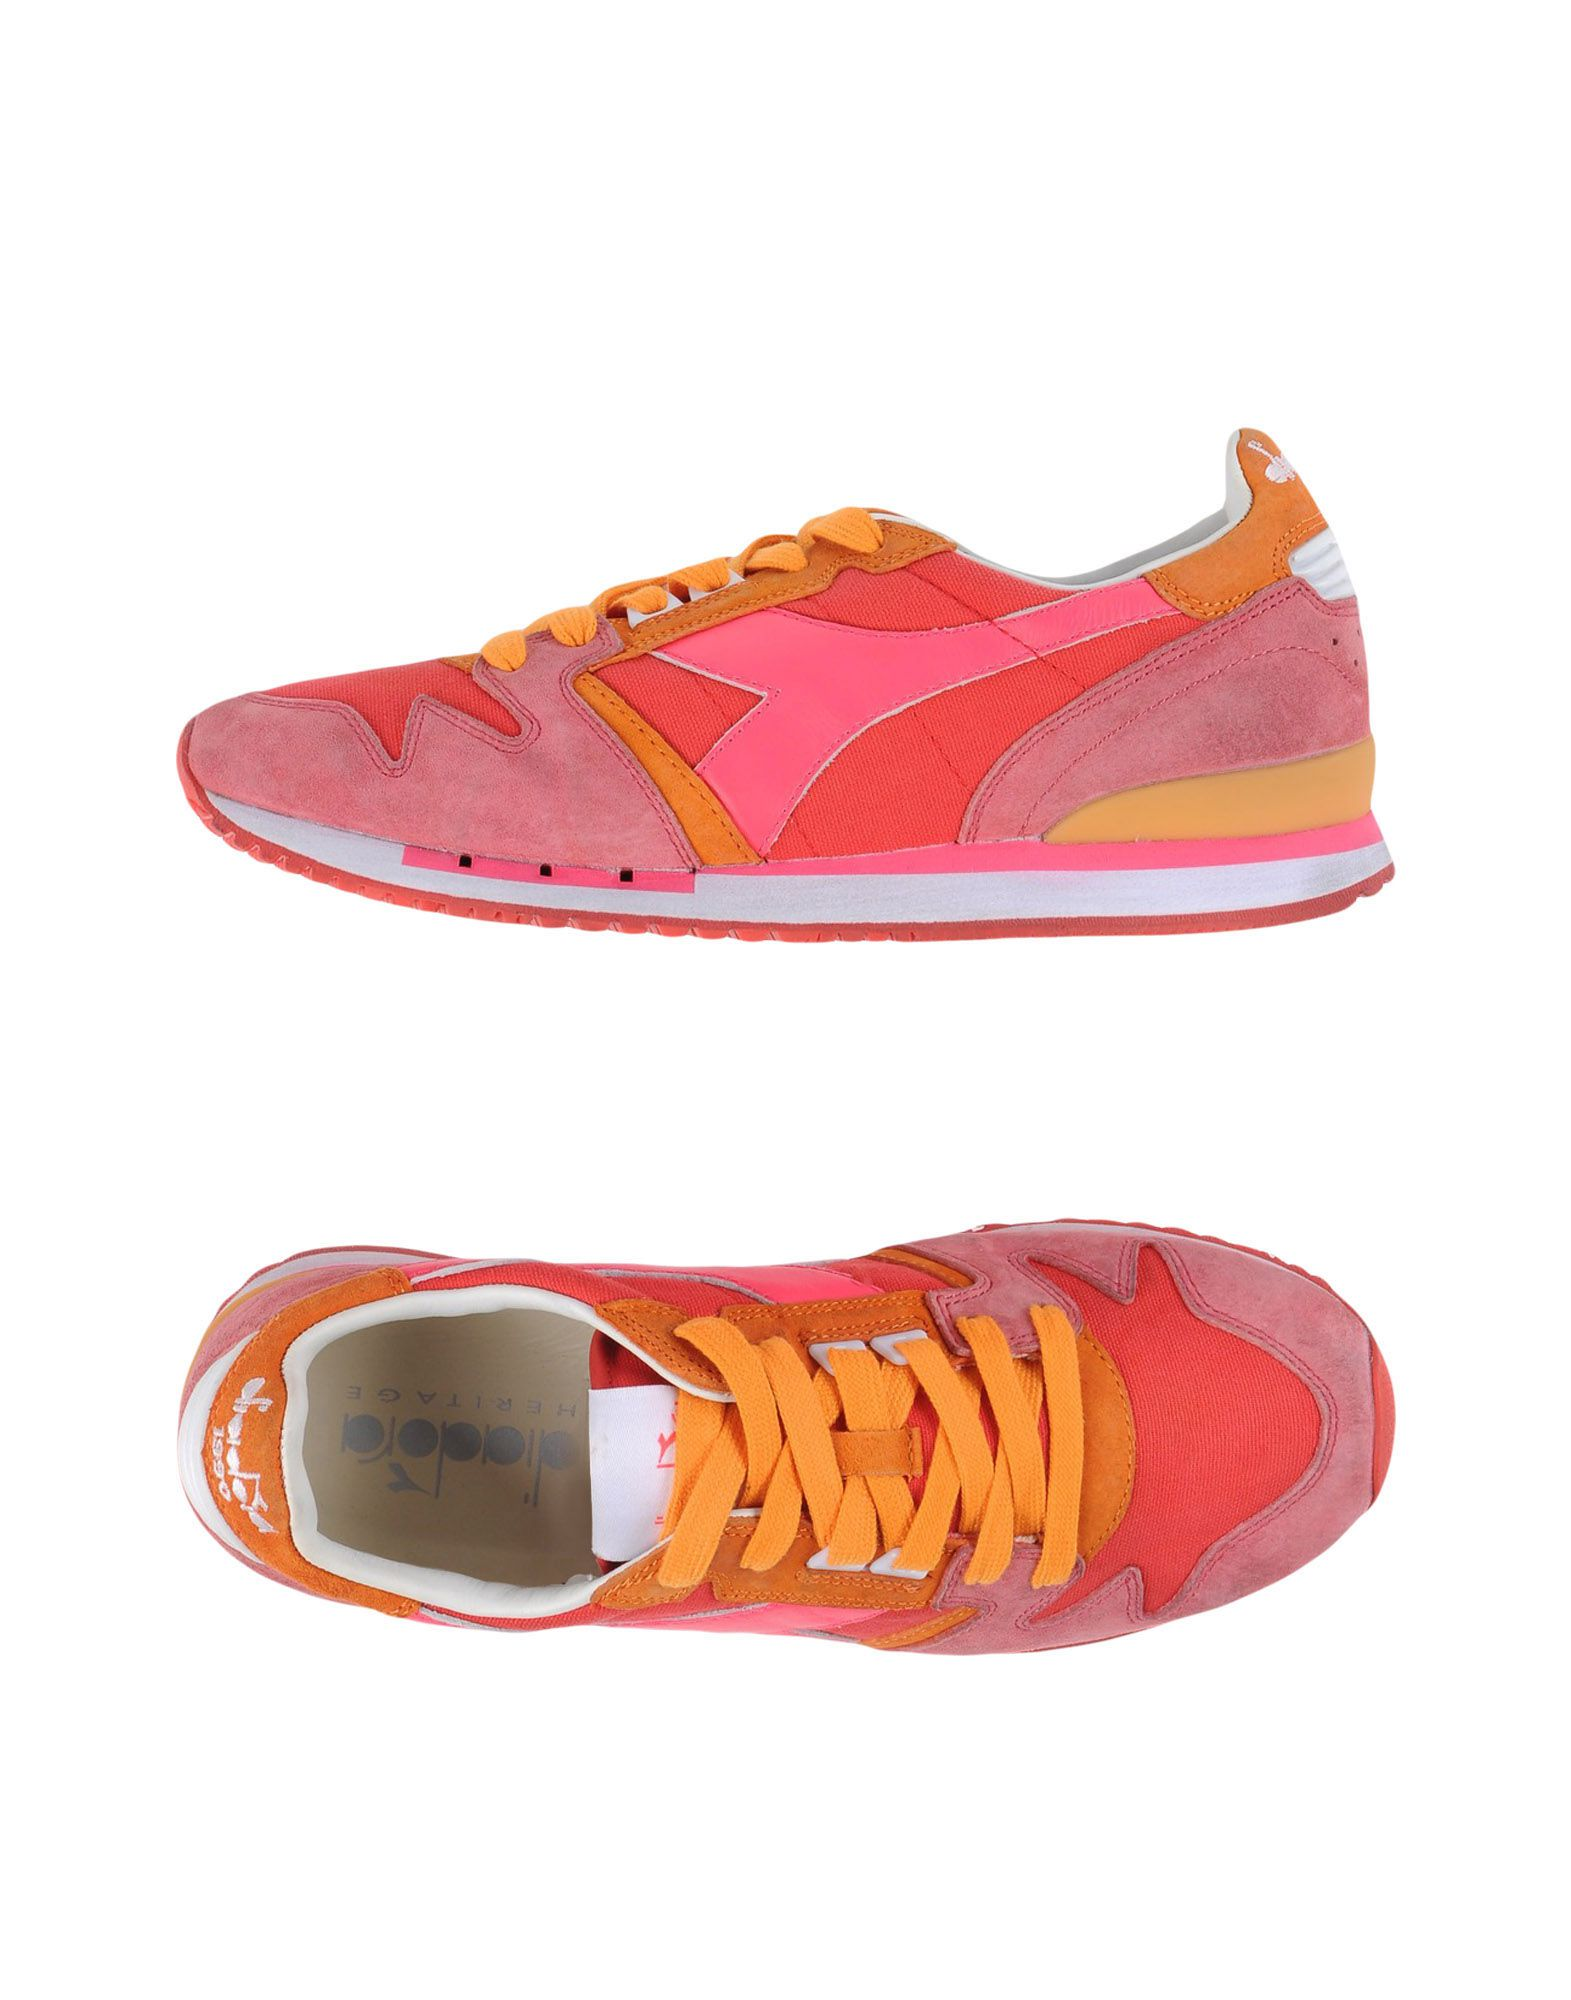 Diadora Heritage Sneakers Sneakers - Women Diadora Heritage Sneakers Heritage online on  Australia - 11343472RB 9b1385